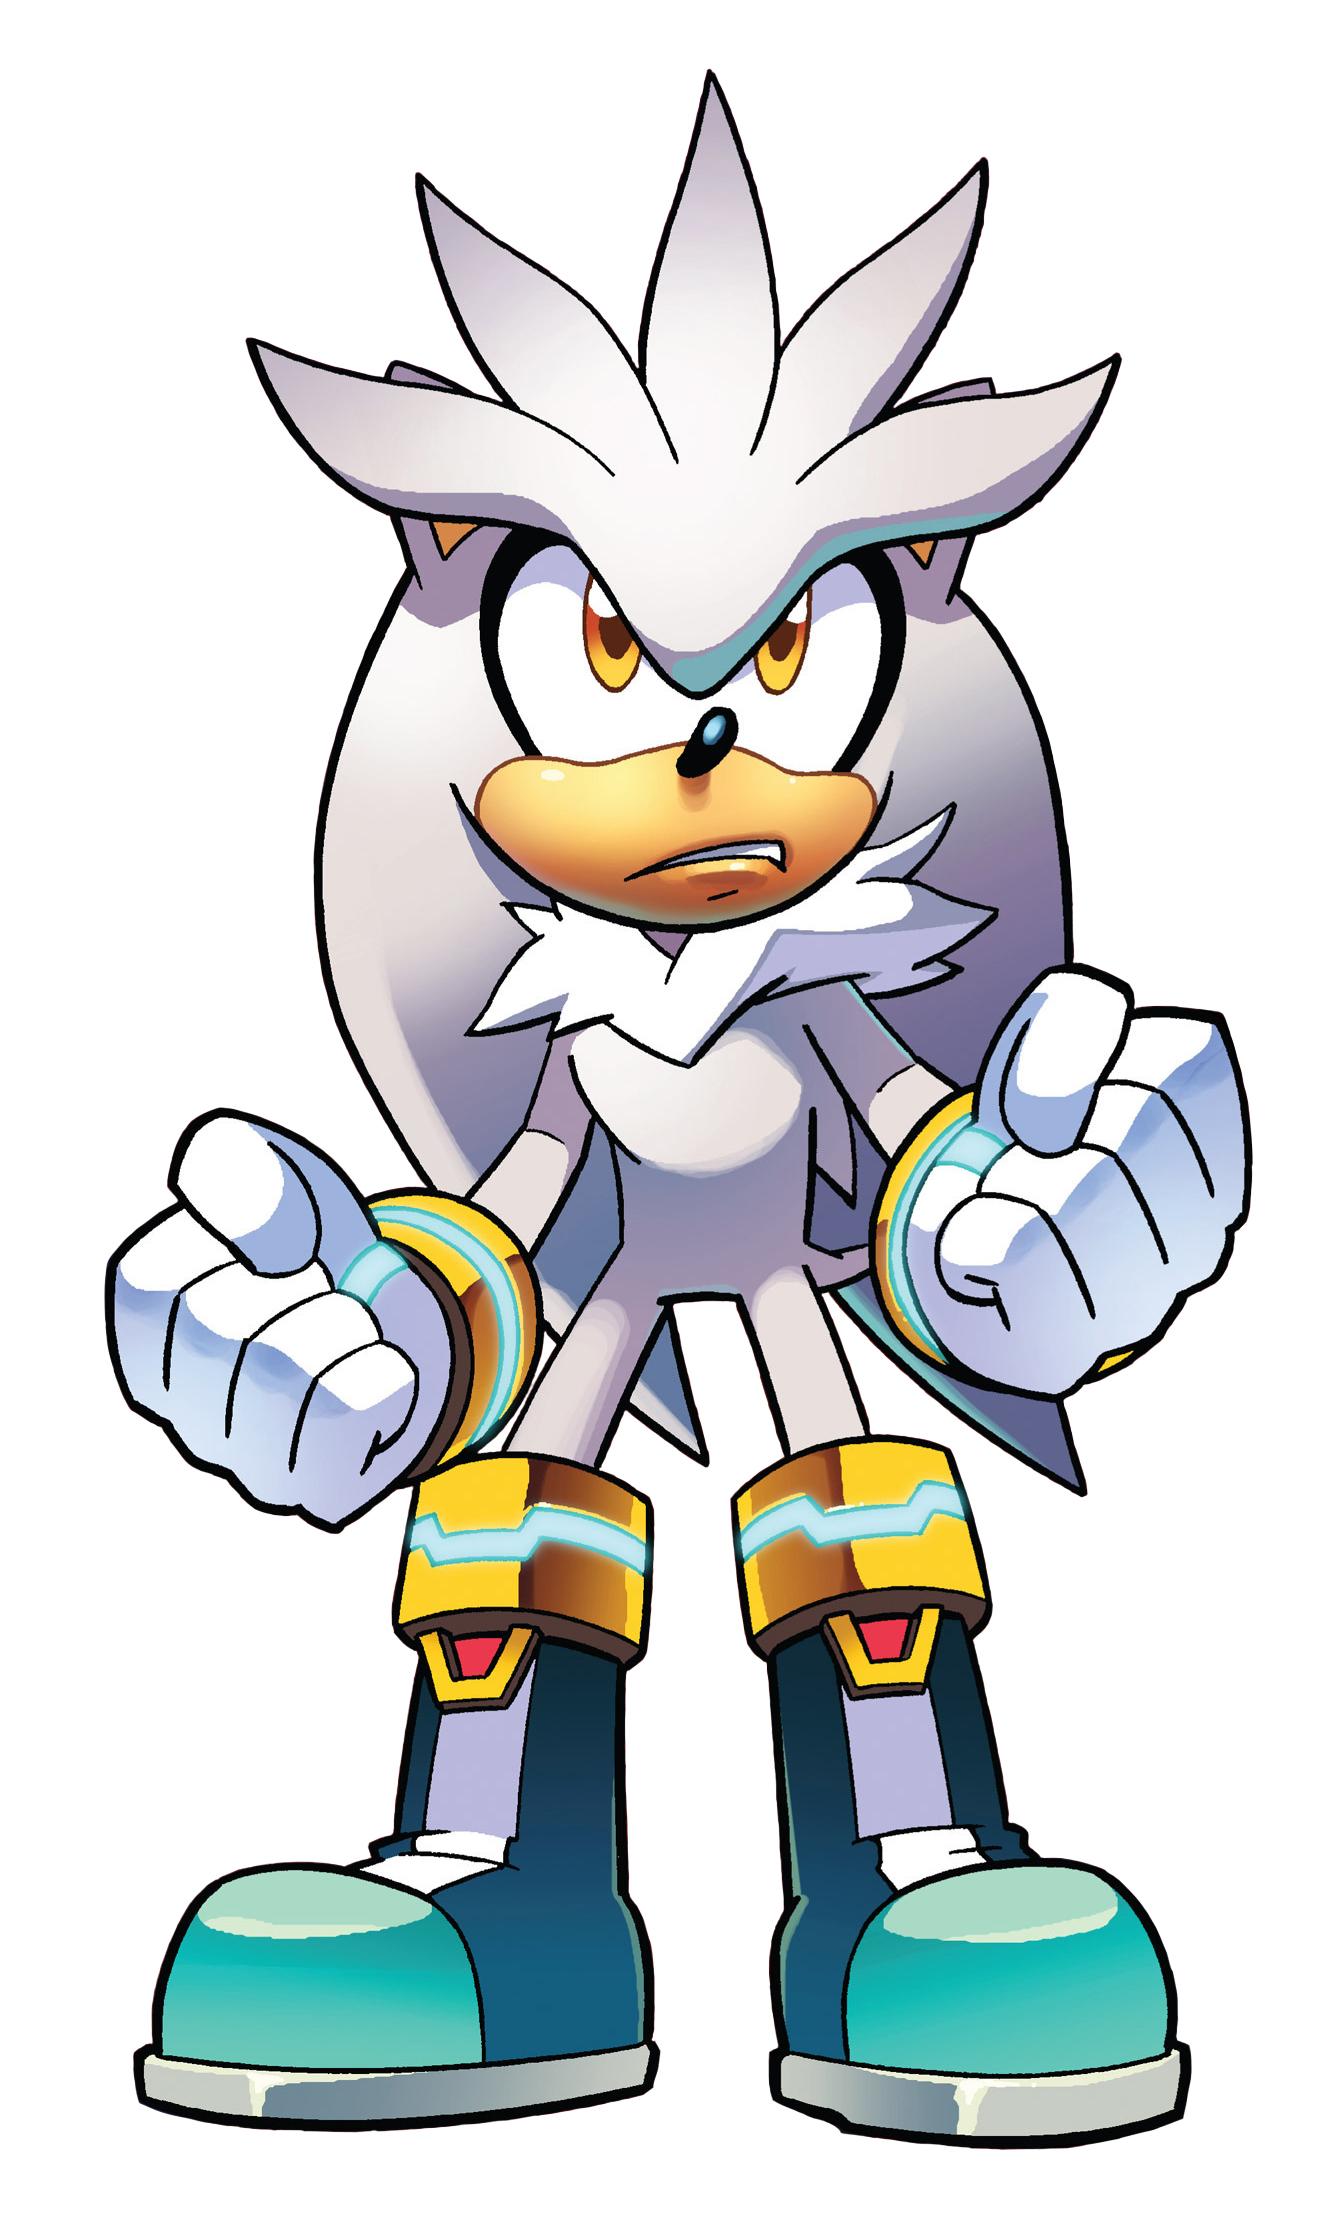 Silver the Hedgehog | Mobius Encyclopaedia | FANDOM powered